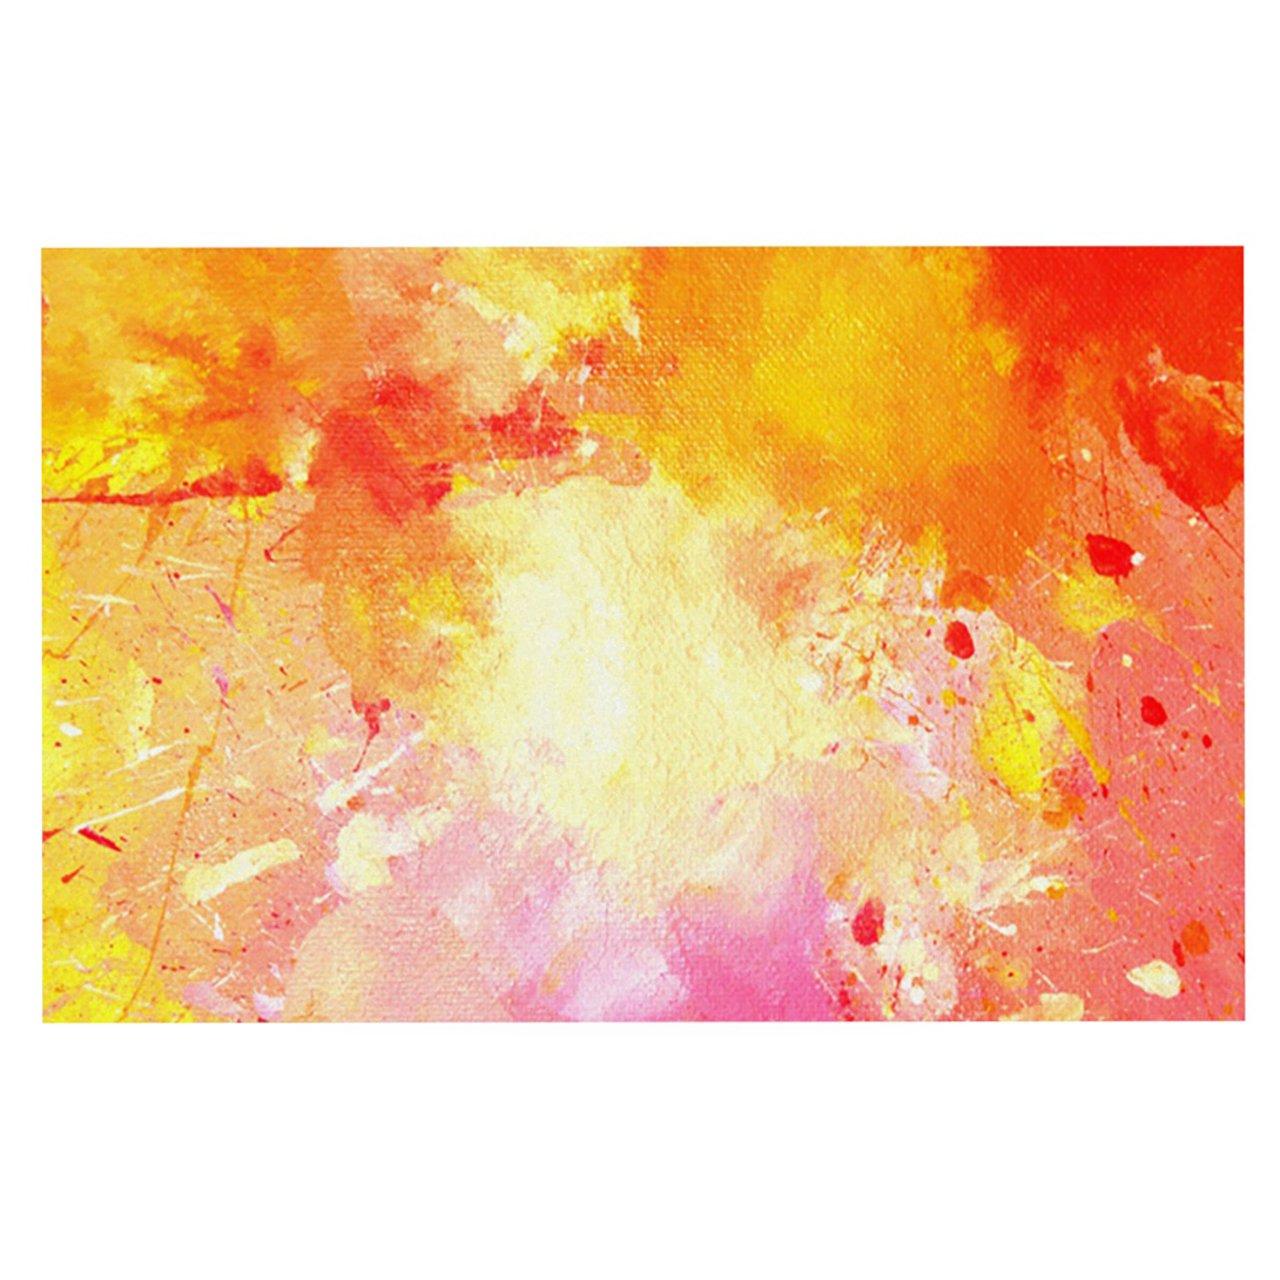 Kess InHouse CarolLynn Tice ''Splash'' Orange Yellow Feeding Mat for Pet Bowl, 18 by 13-Inch